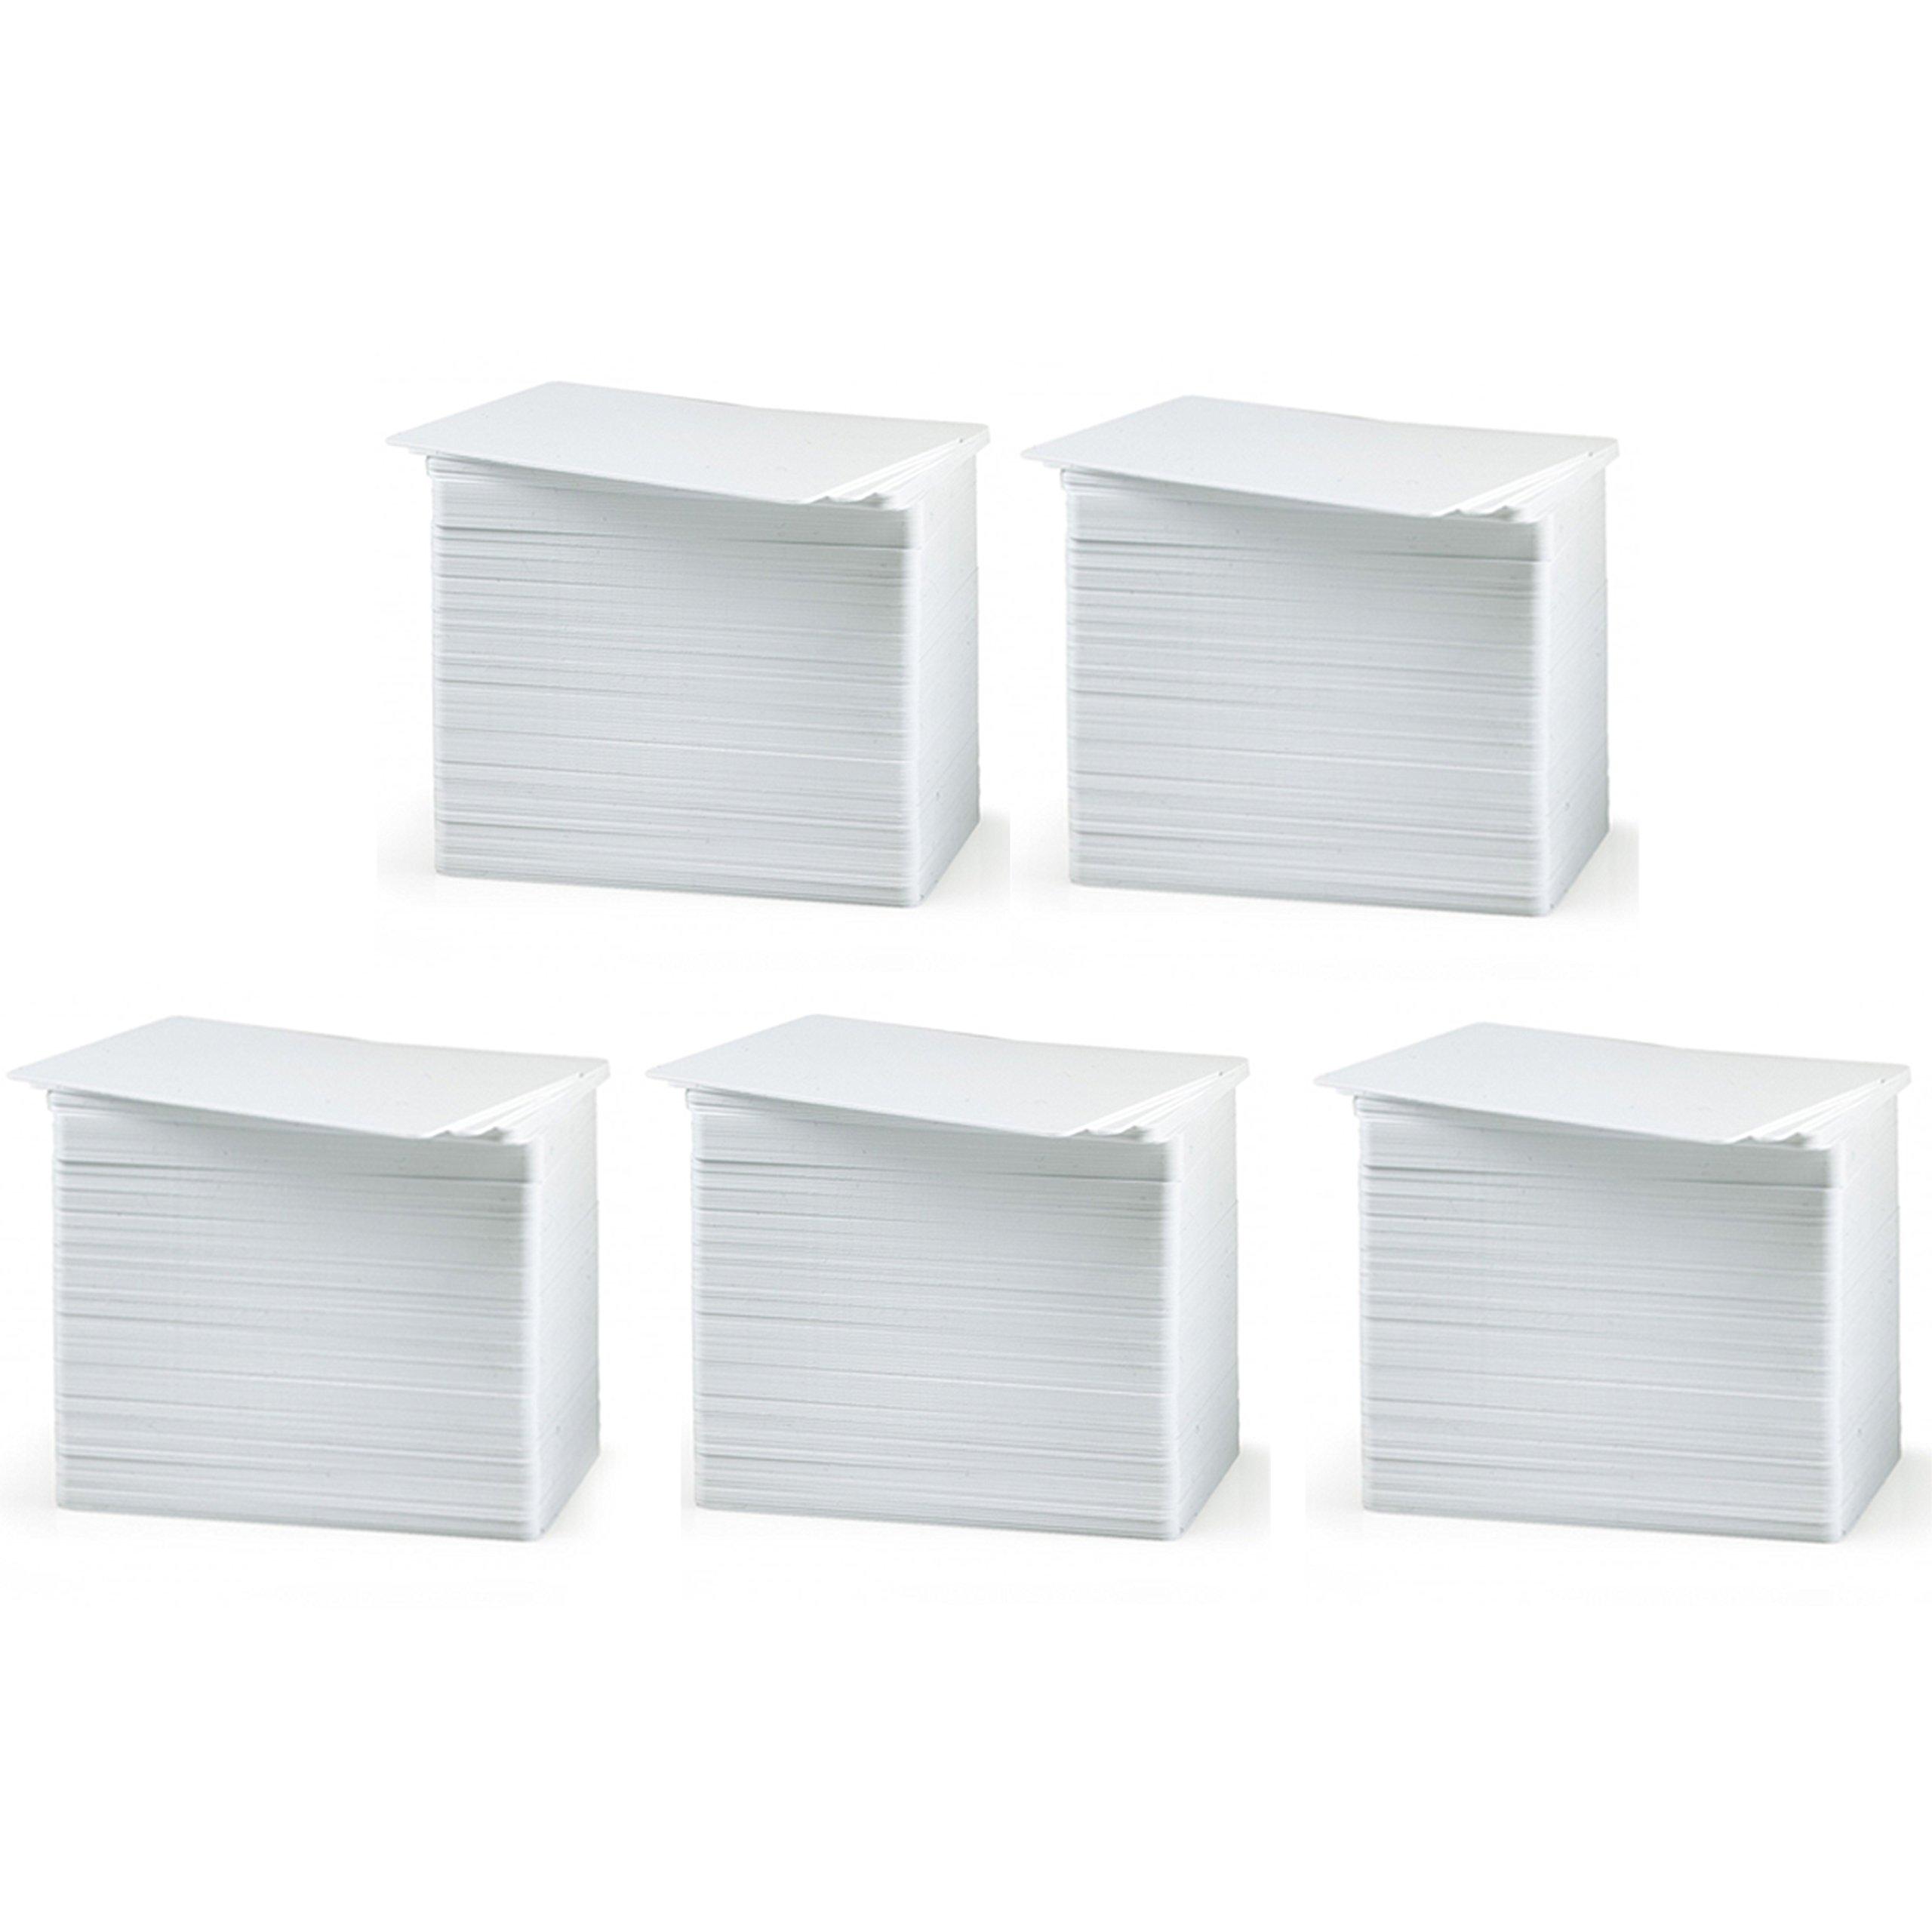 Bodno Premium CR80 30 Mil Graphic Quality PVC Cards - 500 Pack